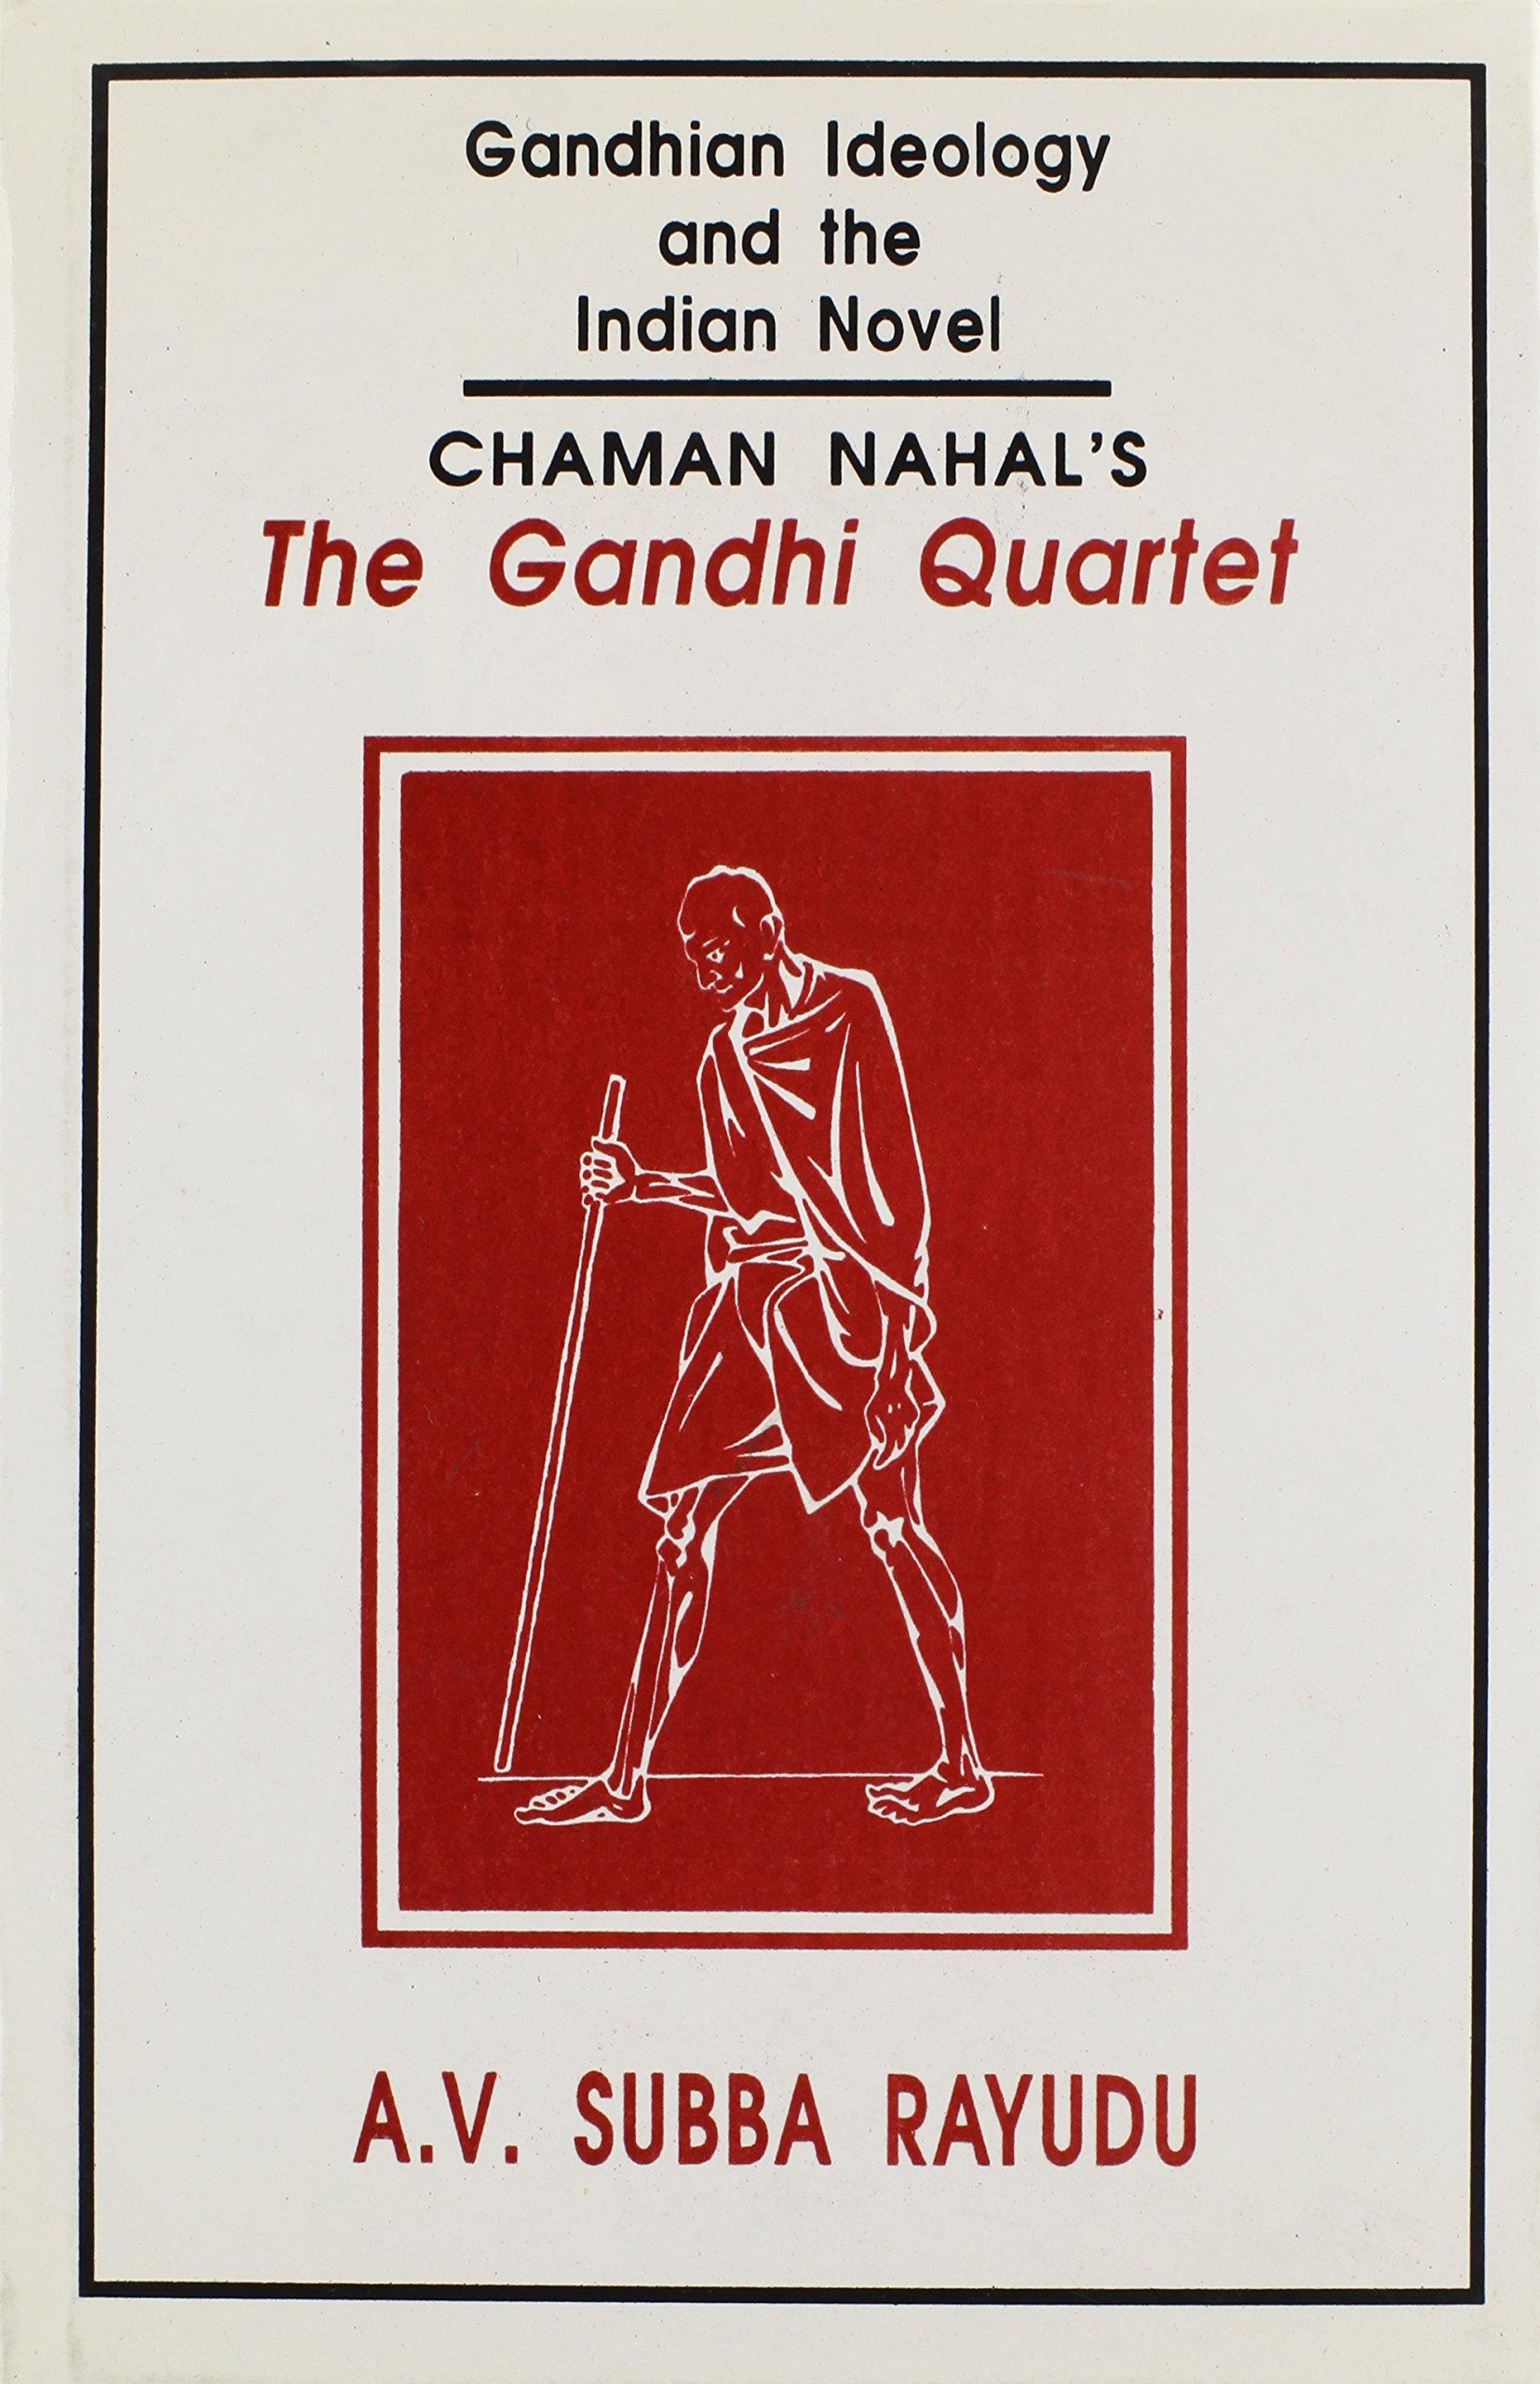 Download Gandhian Ideology and the Indian Novel Chaman Nahal's The Gandhi Quartet pdf